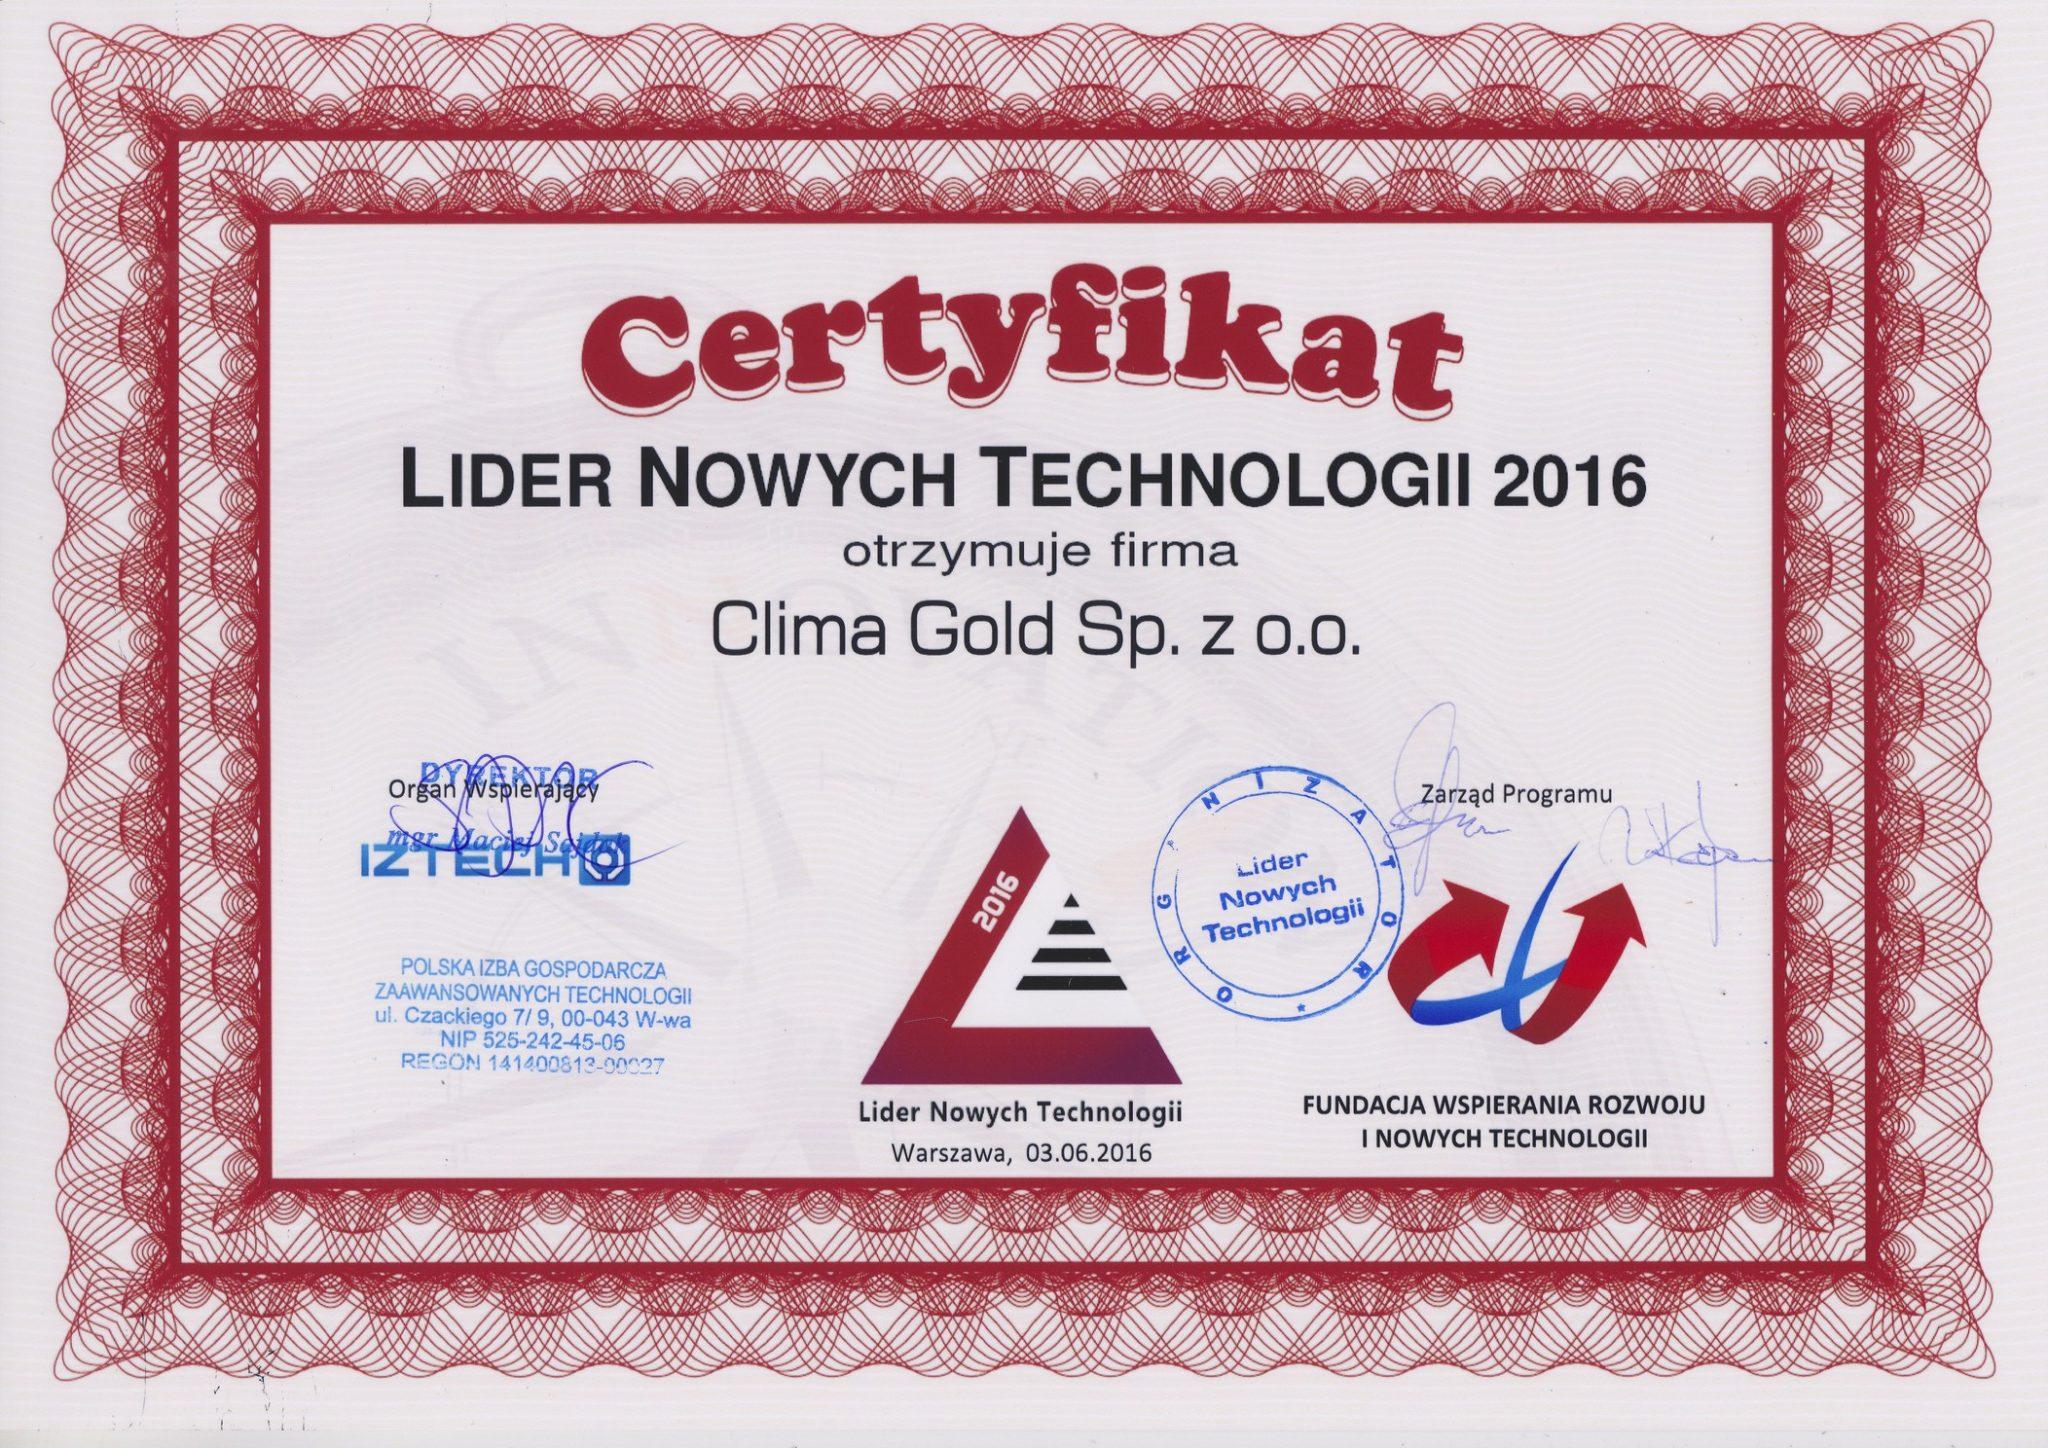 Lider Nowych Technologii 2016 — nagroda dla Clima Gold!